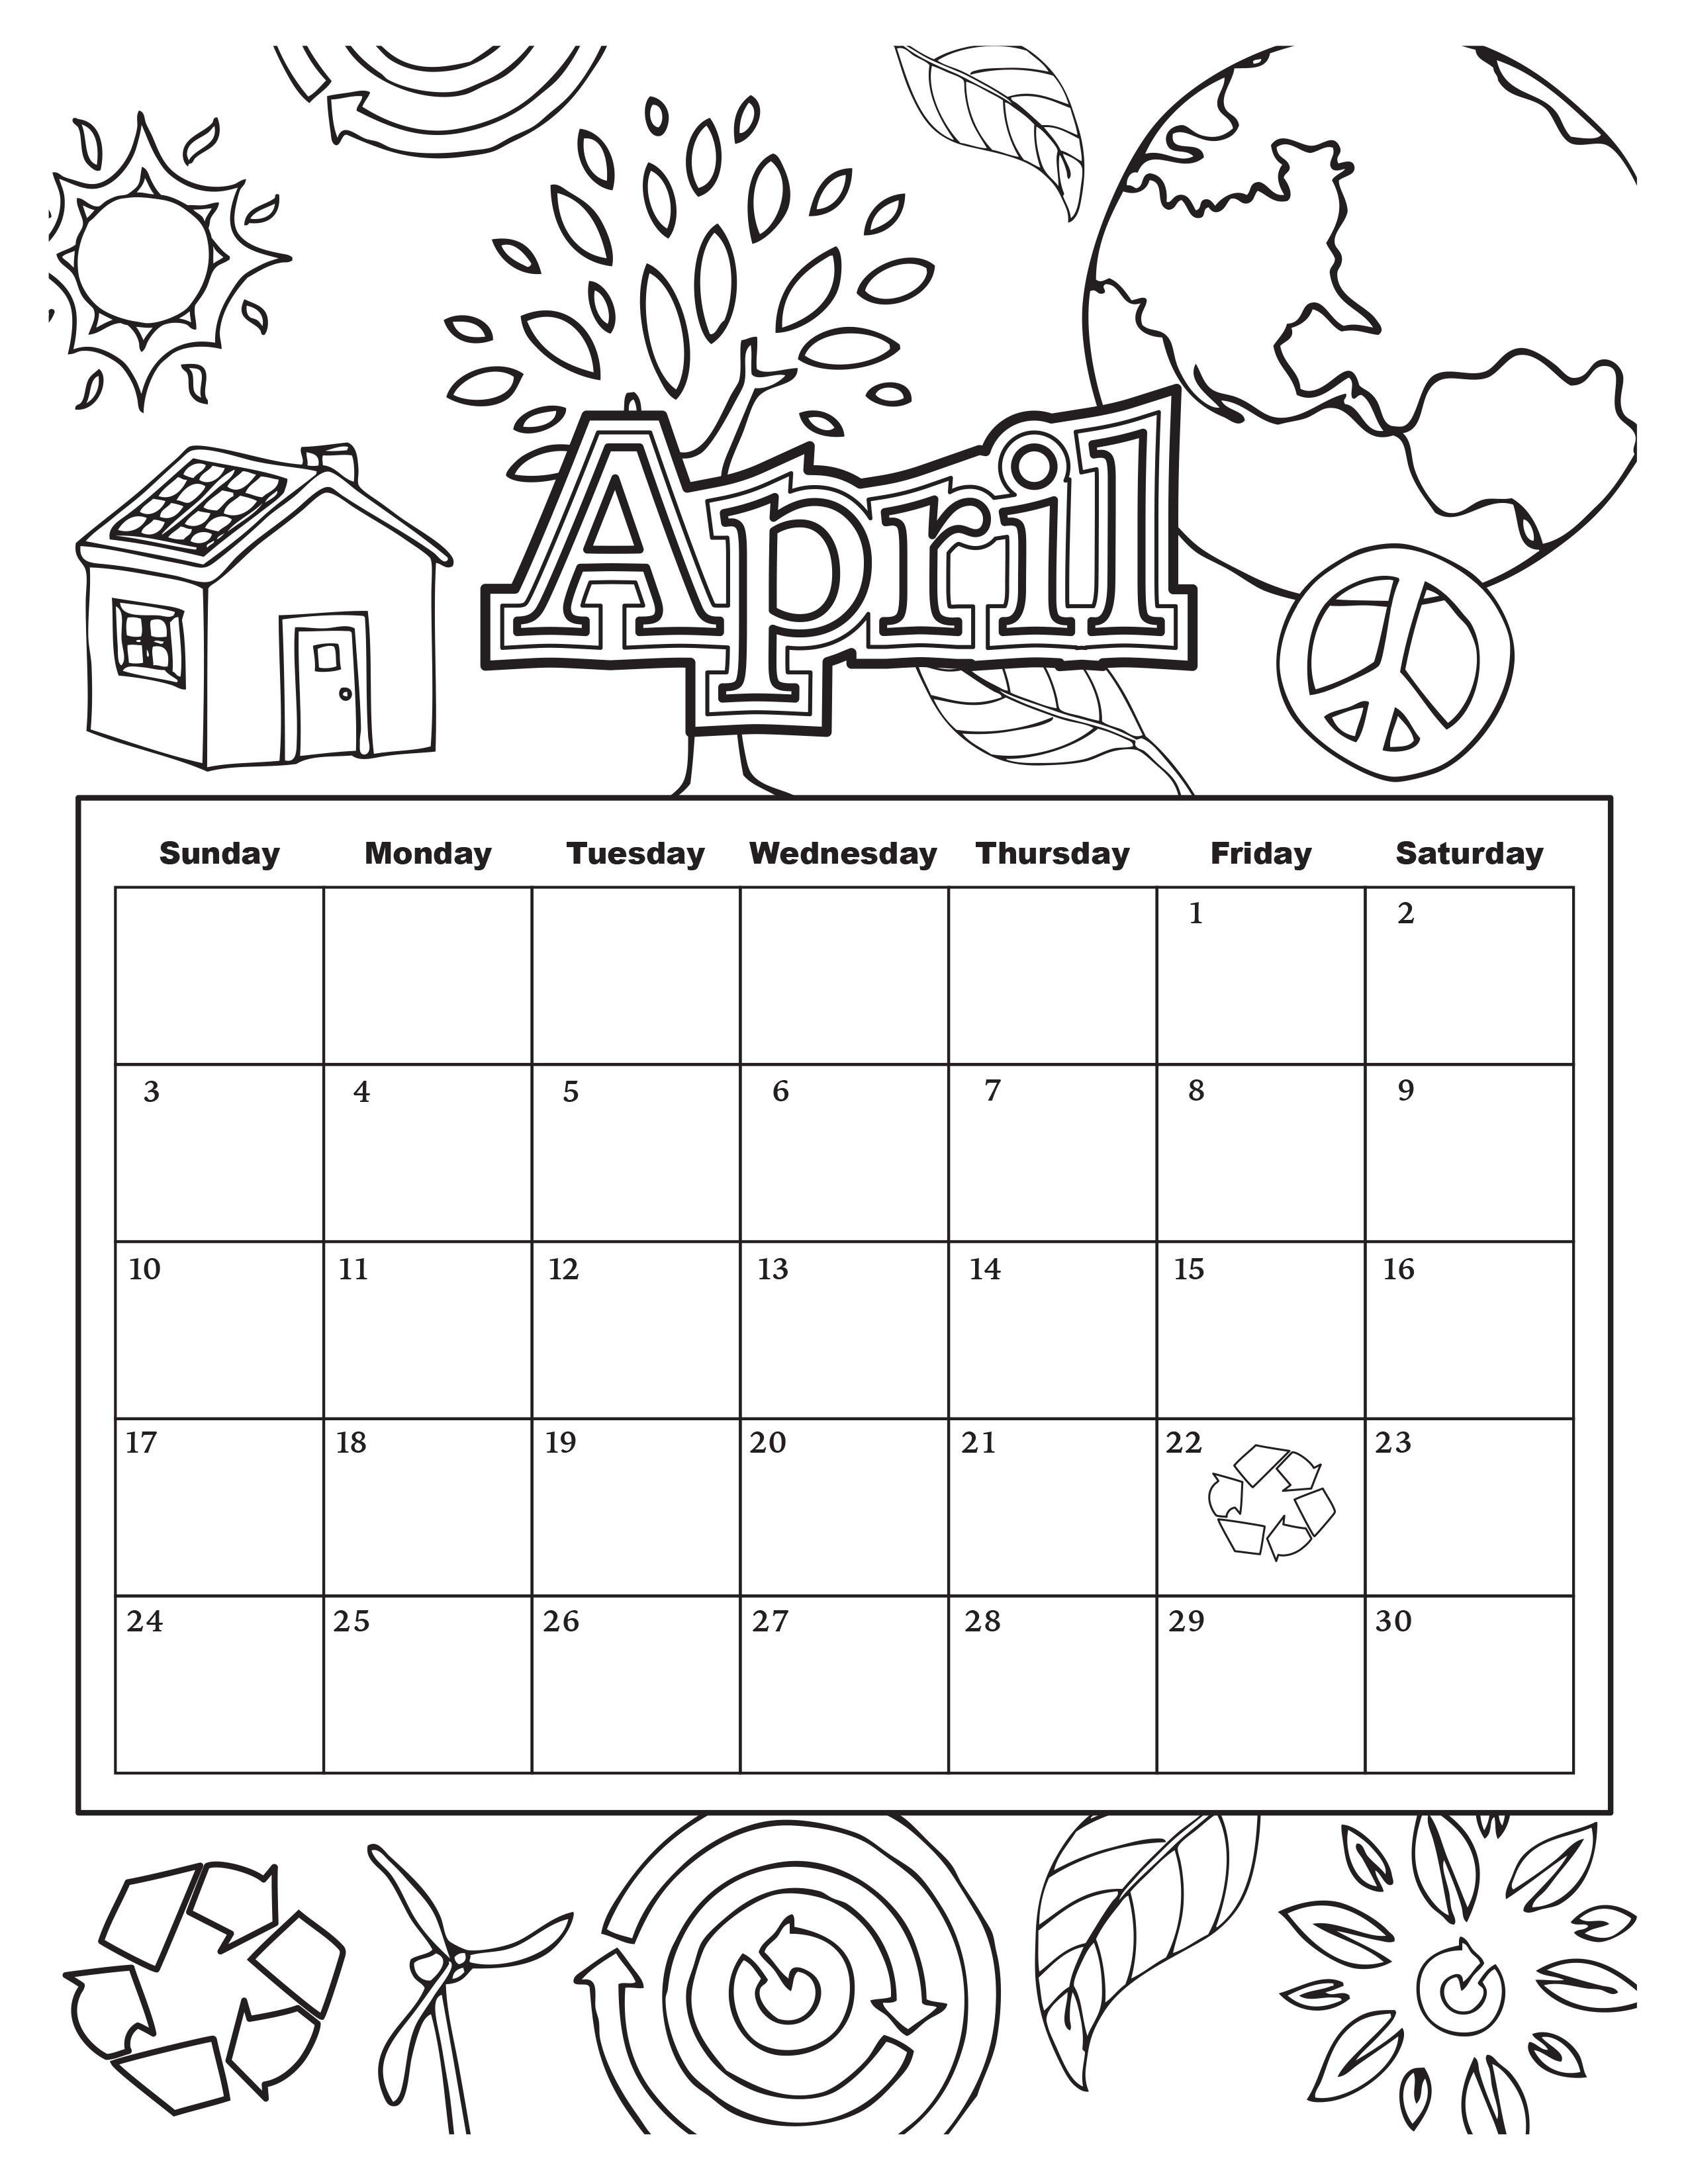 Coloring Book Calendars  April Coloring Pages coloringsuite